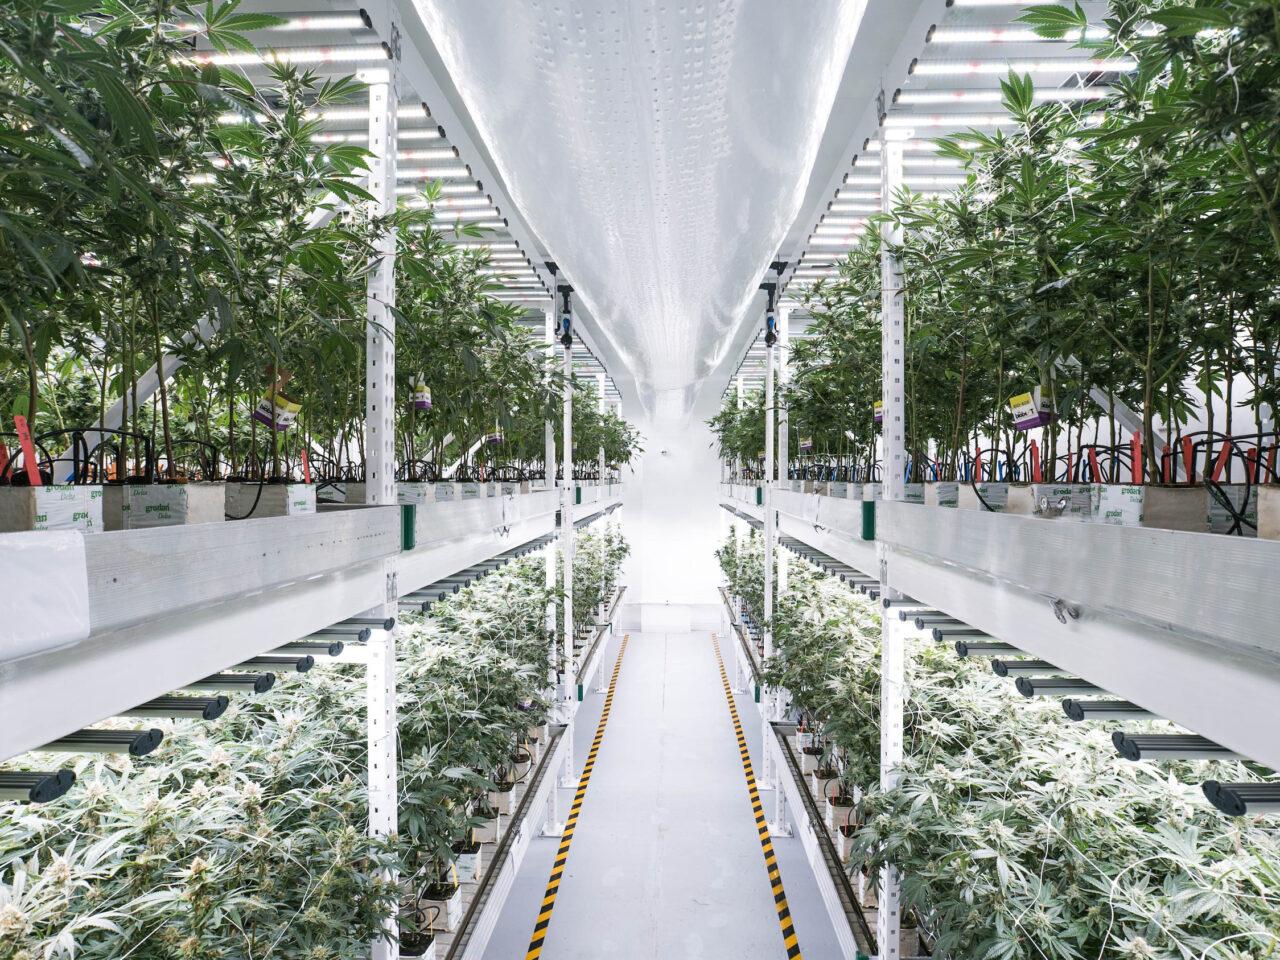 https://www.livfreeconsulting.com/wp-content/uploads/2020/12/Cannabis-Tiered-Farm-2-1280x960.jpg